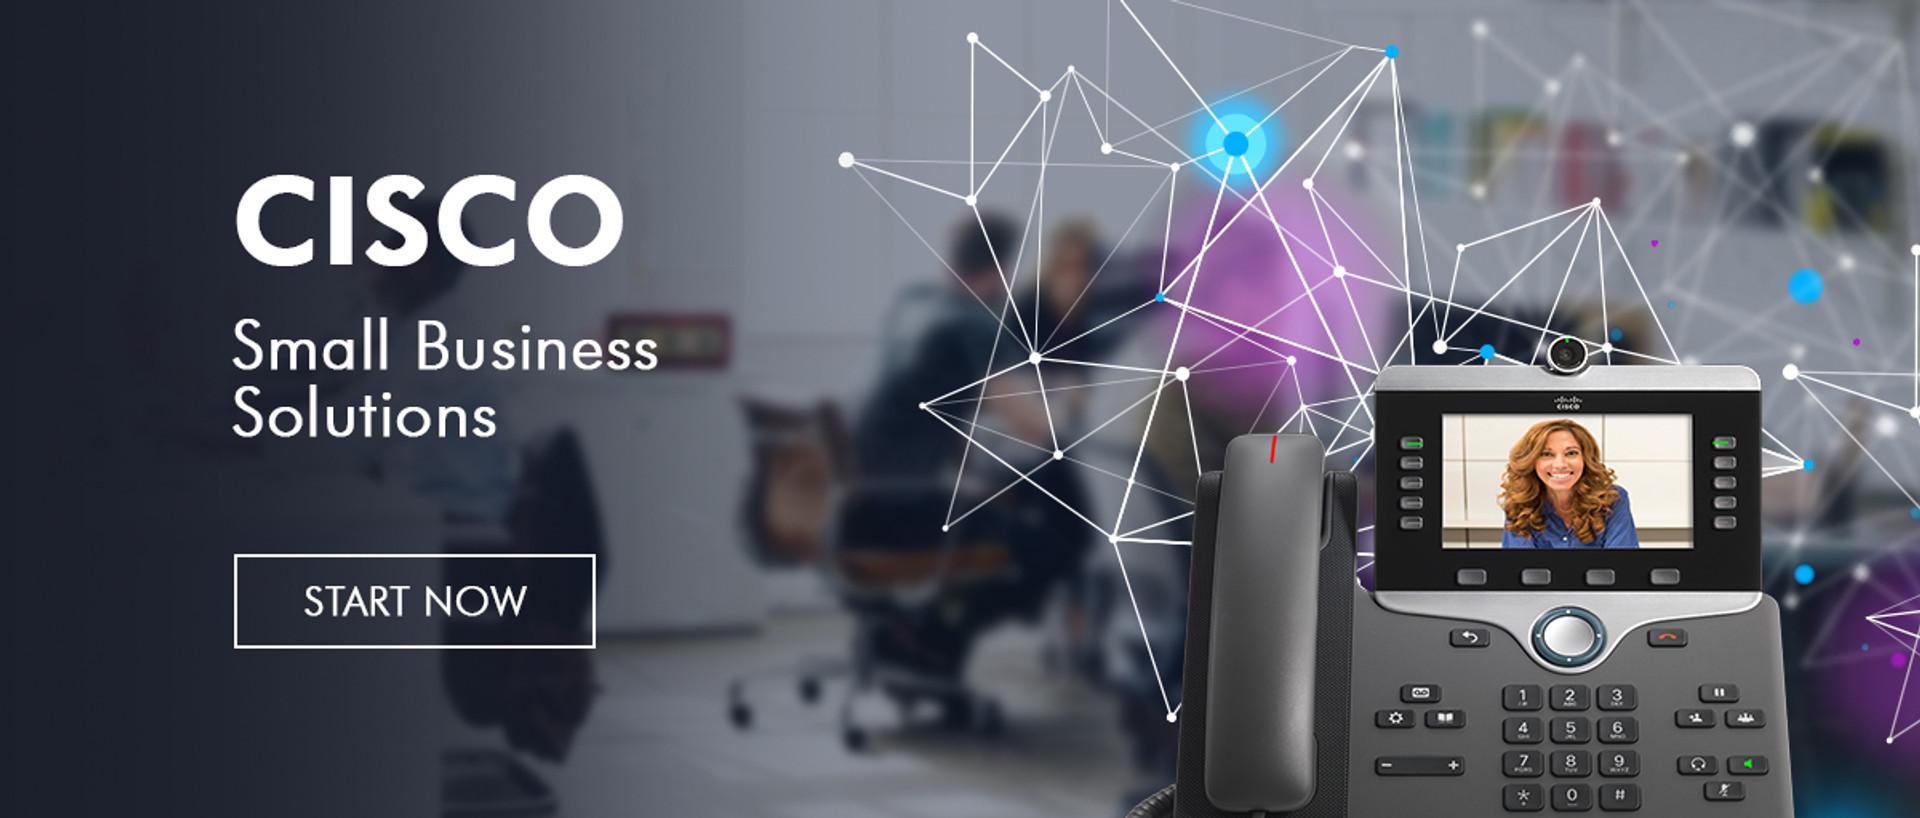 Cisco Small Business Solution